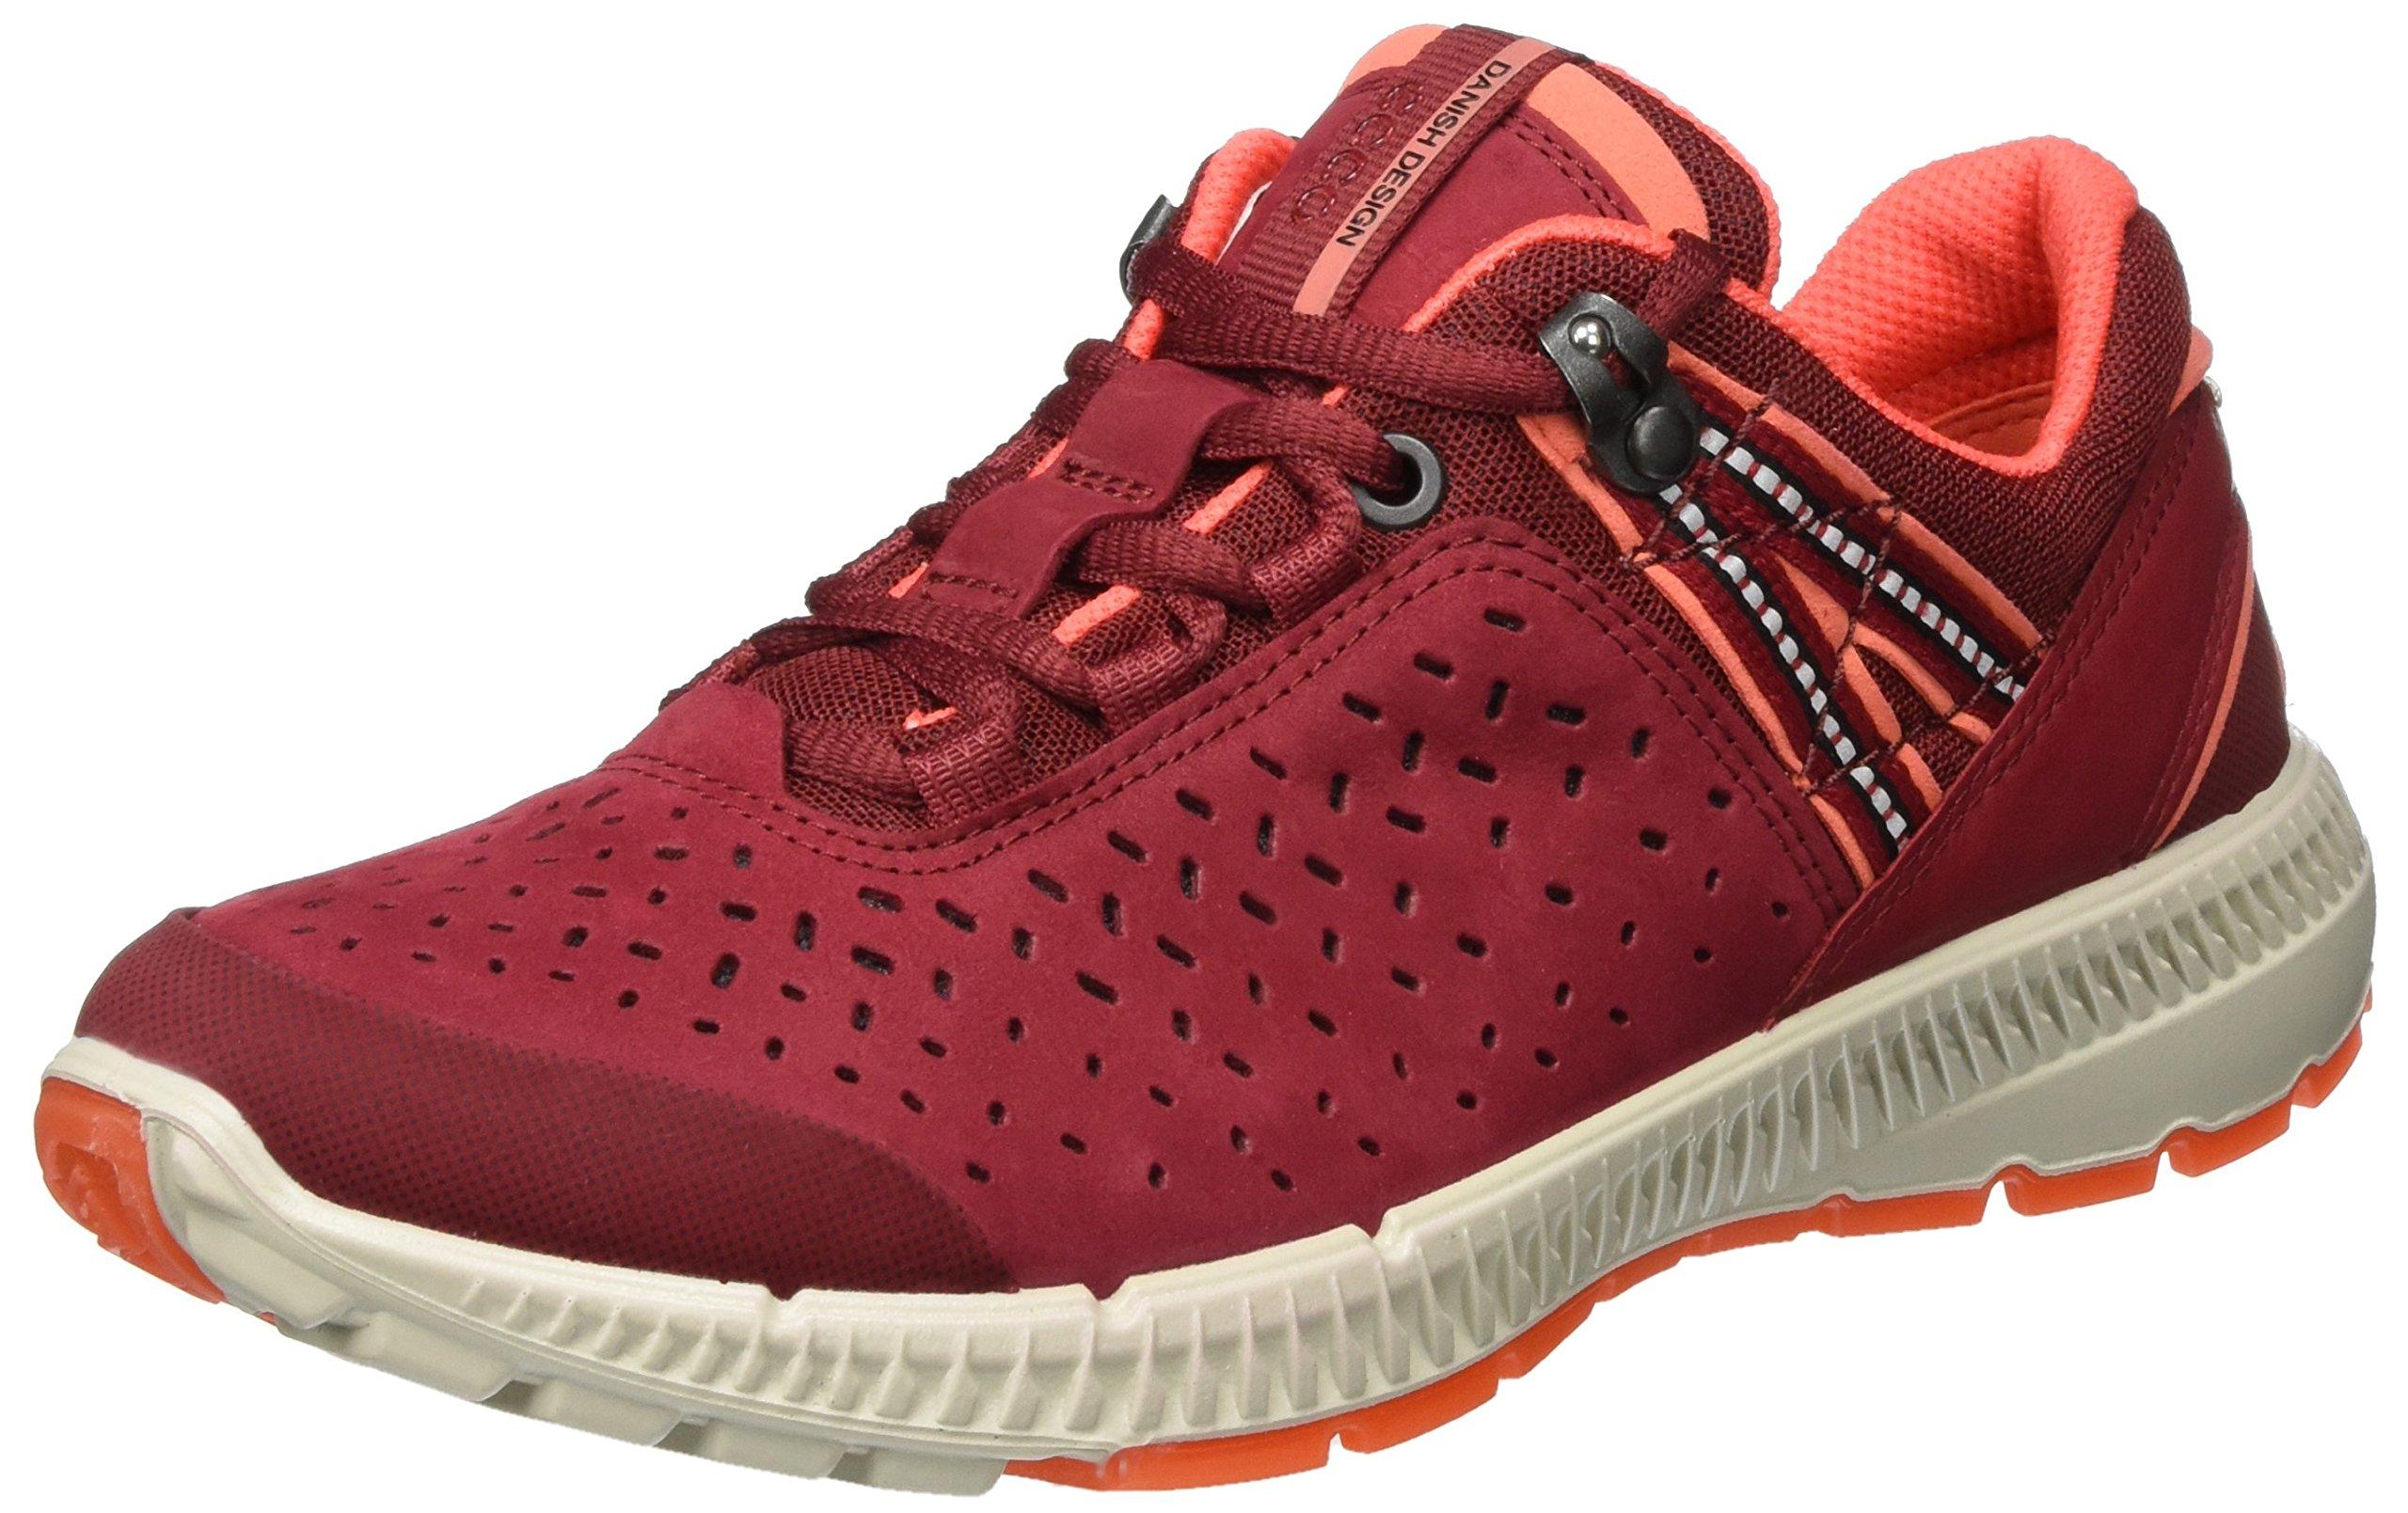 Intrinsic Basses FemmeRouge Brick39 Eu Ecco TrSneakers JKl1TFc3